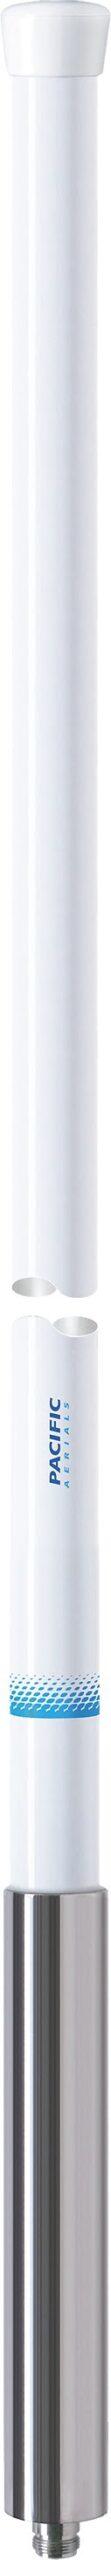 VHF 2,5m x 32mm N-type socket-0